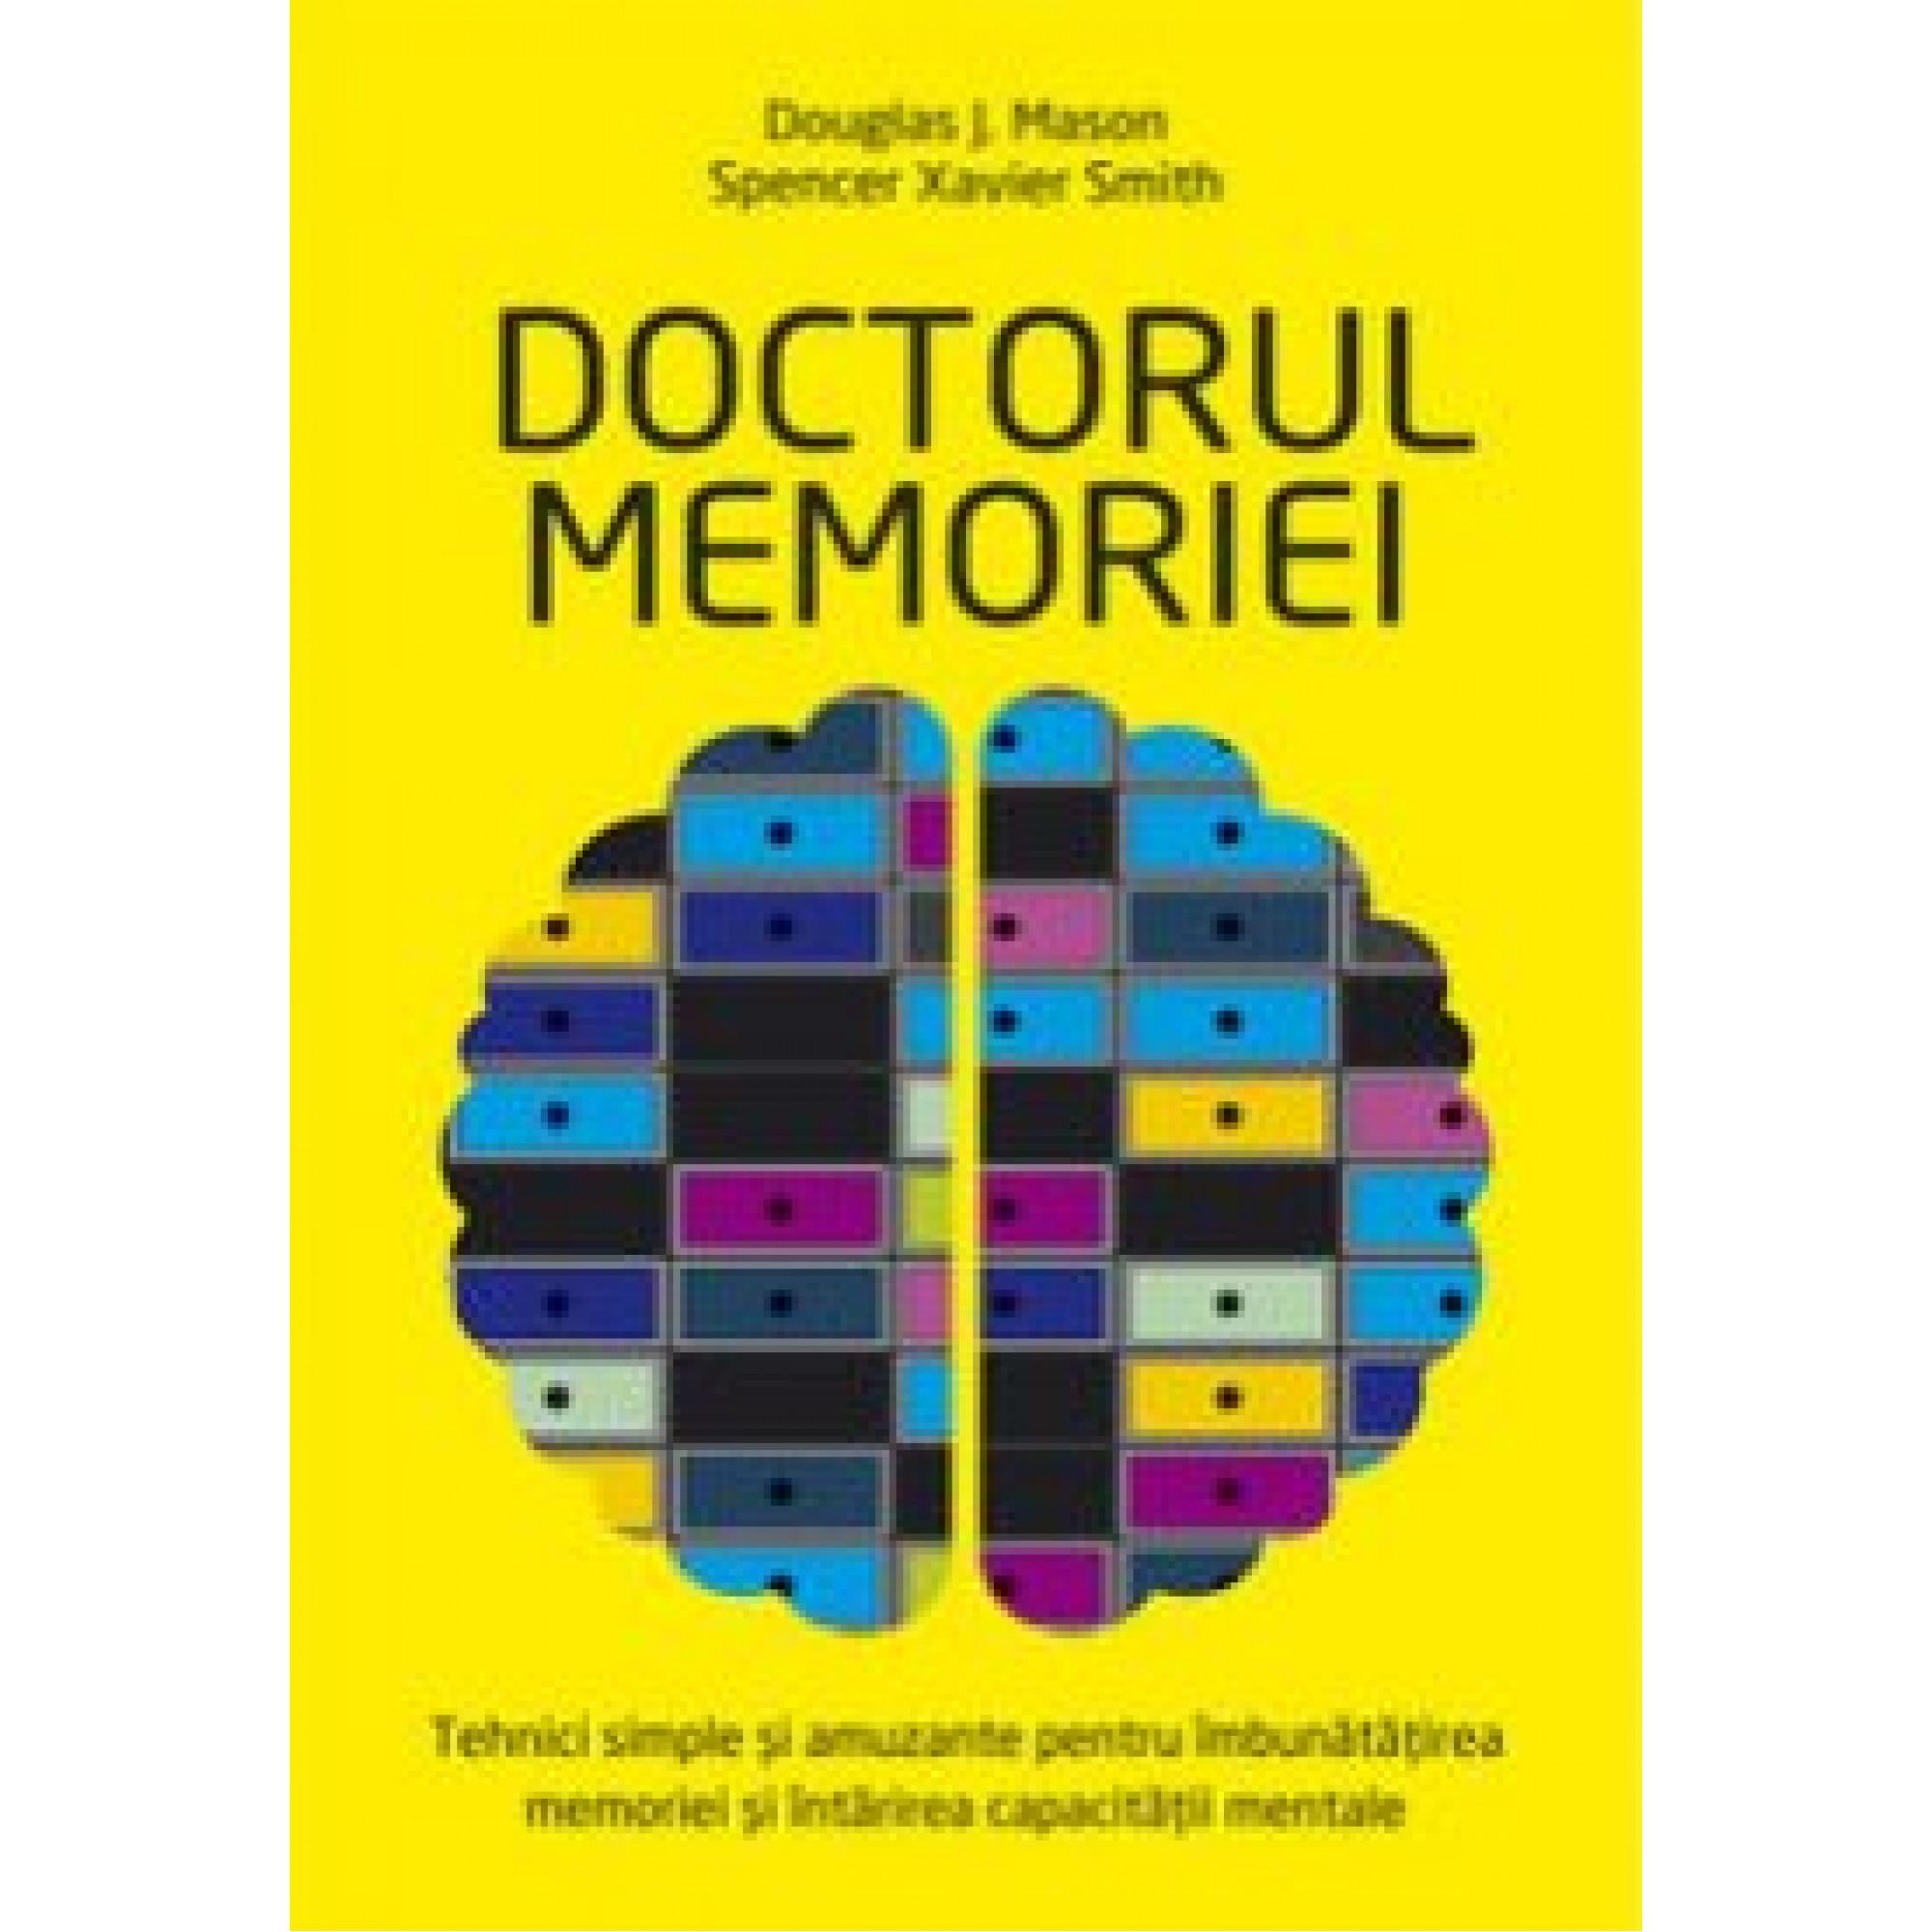 Doctorul memoriei; Douglas J. Mason, Spencer Xavier Smith